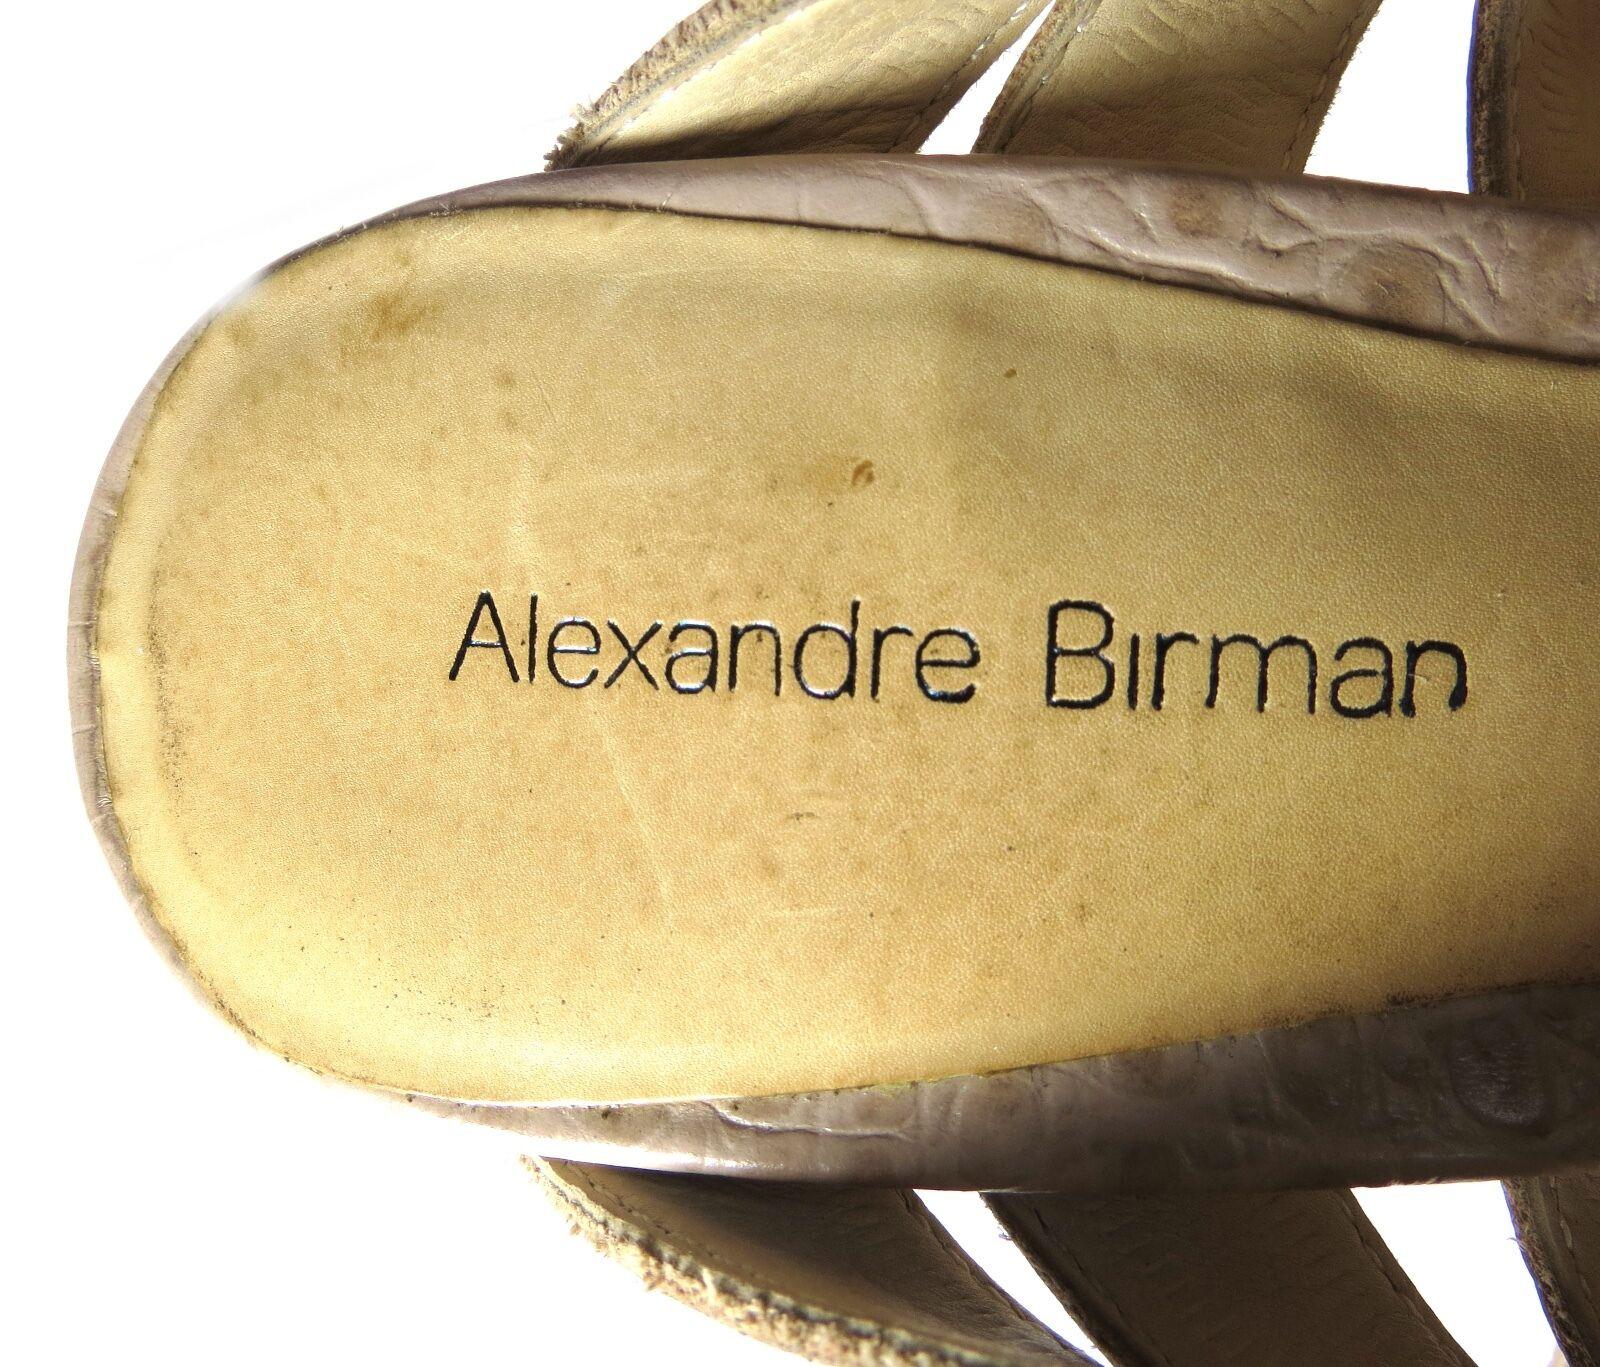 Alexandre Birman Taupe Sandale Crocodile Embossed Platform Wedge Sandale Taupe Heels Größe 7 ae1033